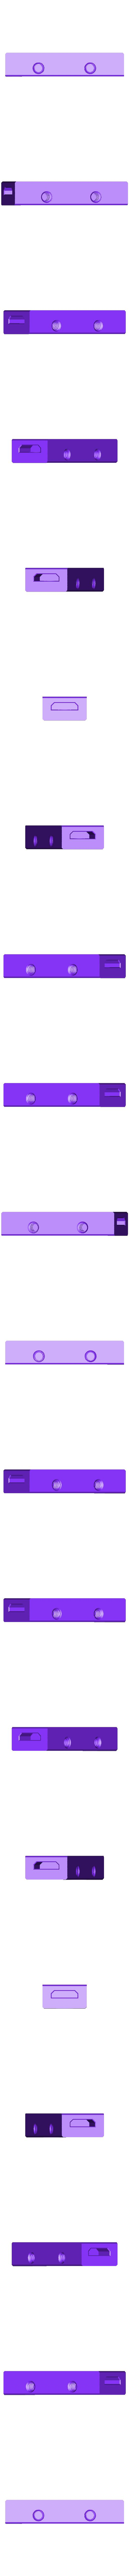 passengers_chassis_bottom.stl Download STL file Toy train construction set - whole train combo • 3D print object, kozakm